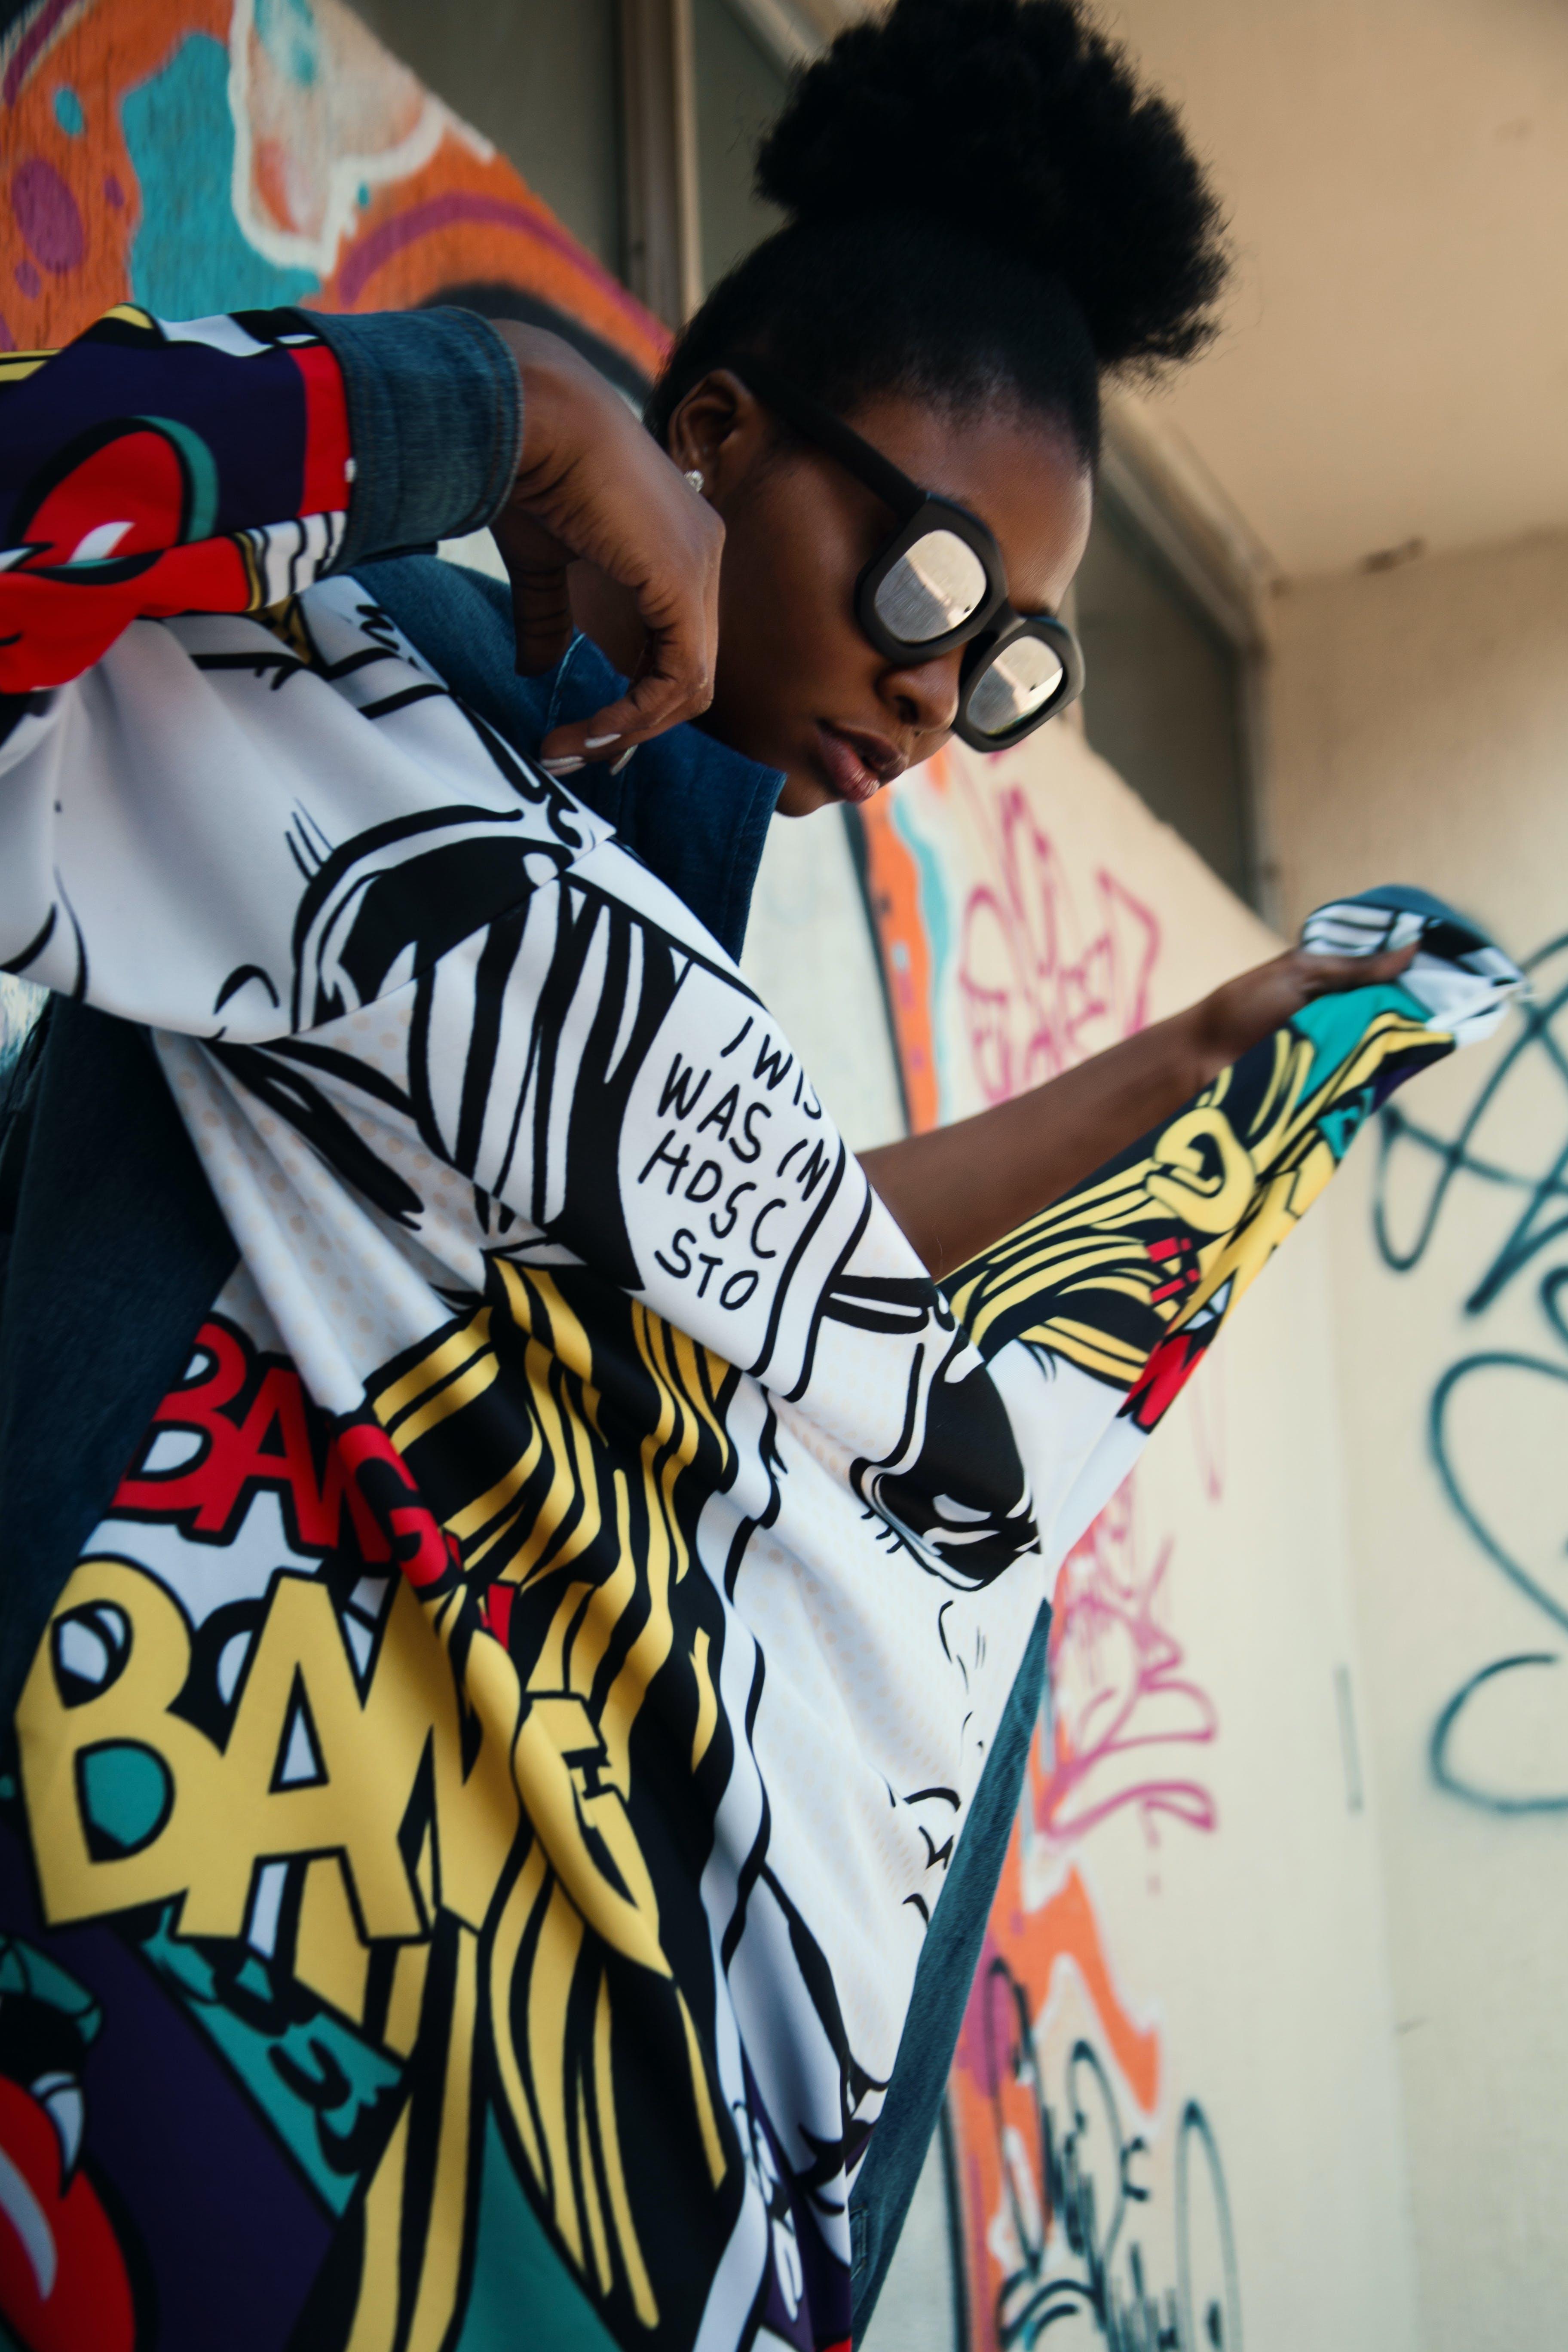 Kostenloses Stock Foto zu afroamerikaner-frau, dame, design, farbige frau